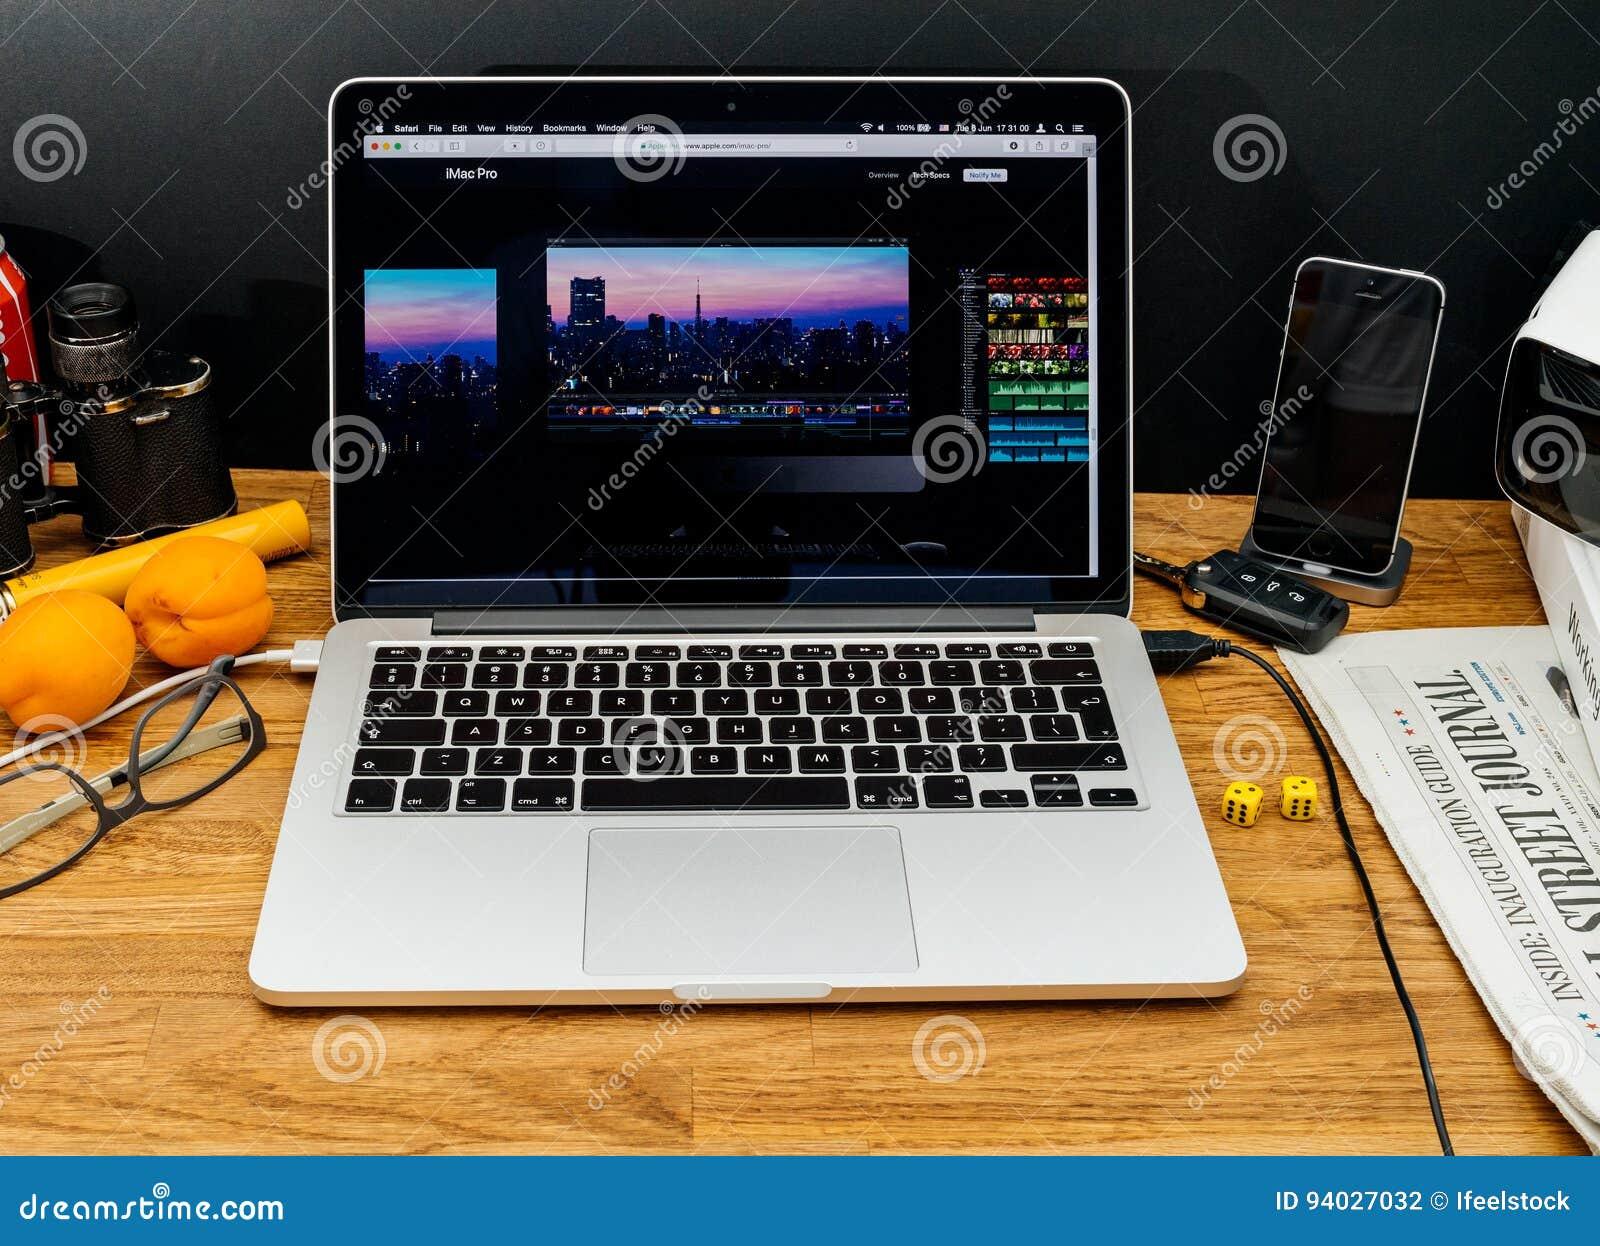 imac pro for photo editing